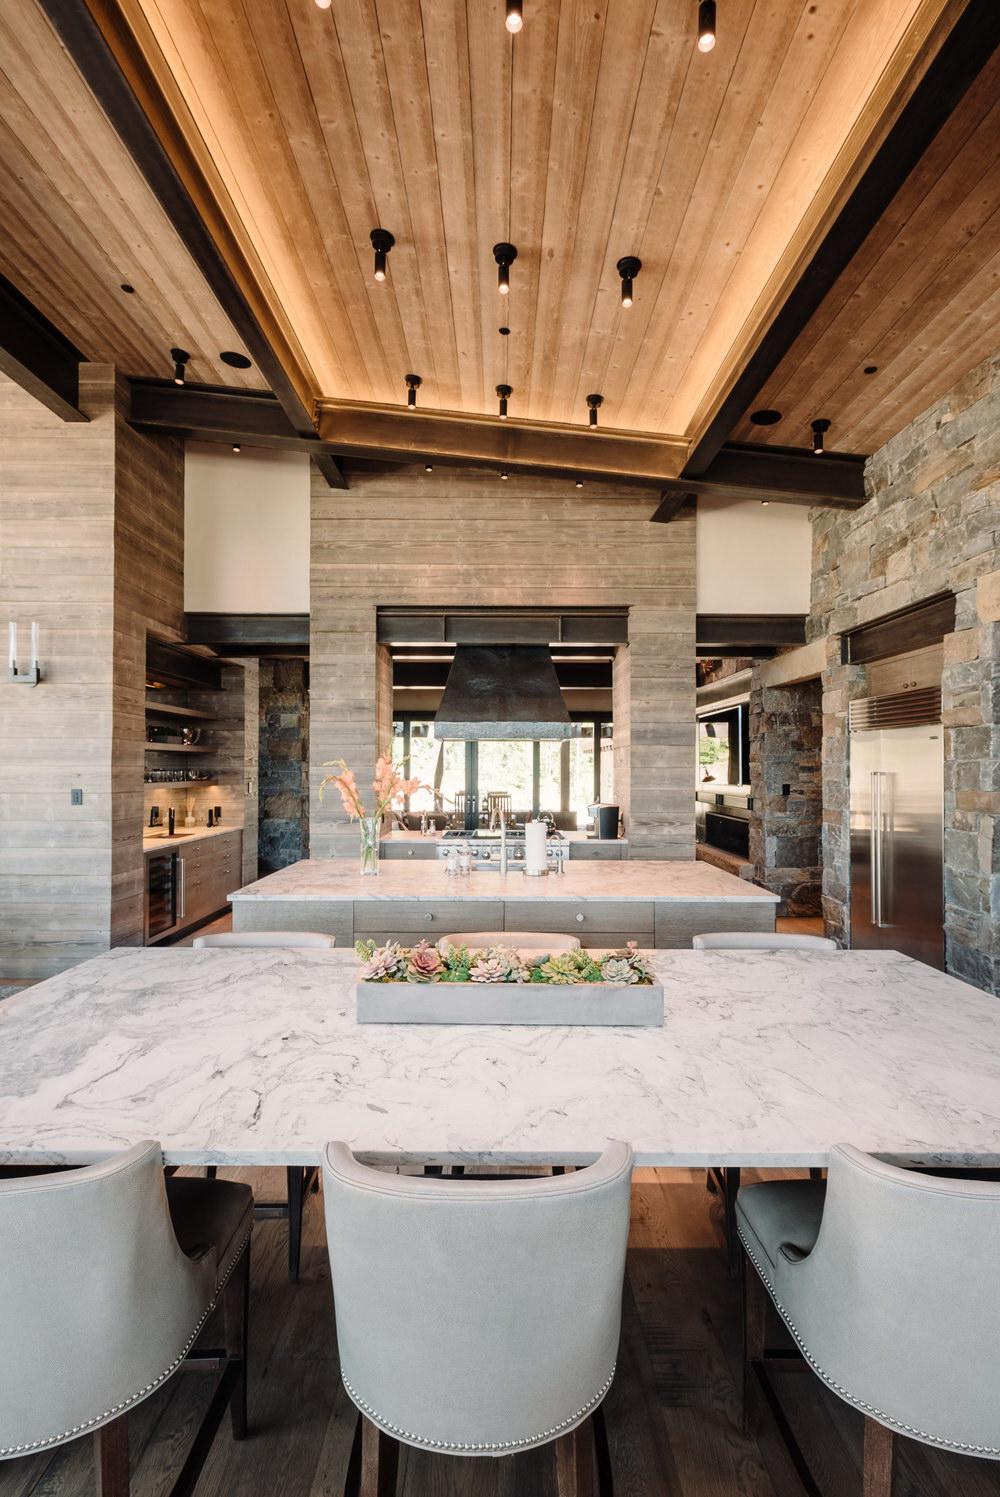 Mountain Peek | Modern Rustic Home in Montana | Wowow Home Magazine